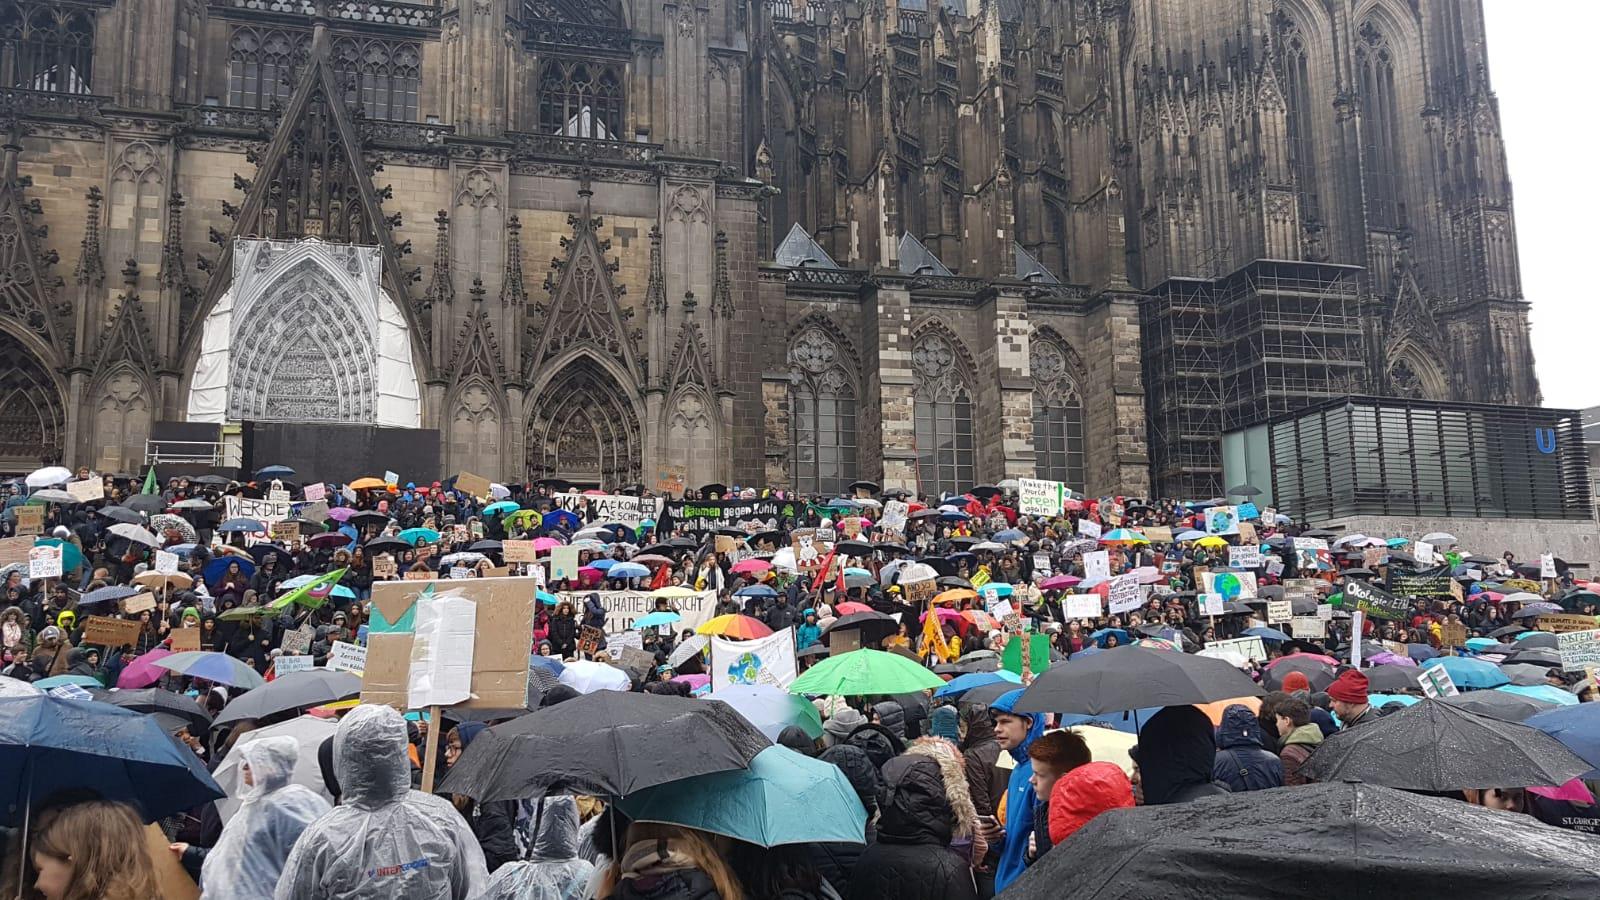 #Climatestrike Gloabal #Fridaysforfuture (c) Marius Mull